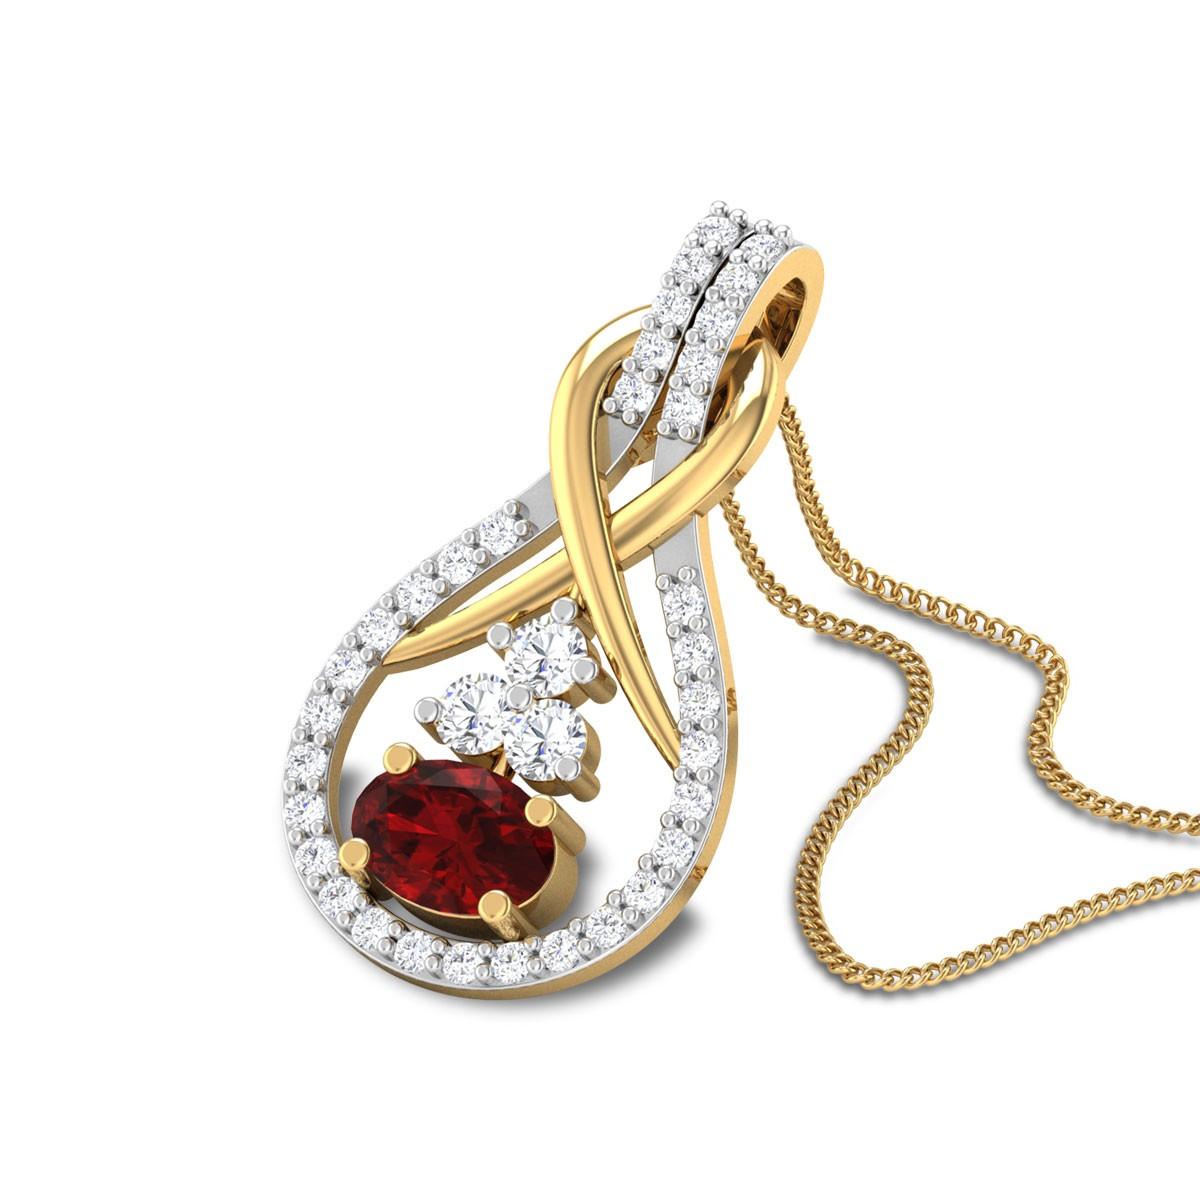 Vita Diamond and Ruby Pendant